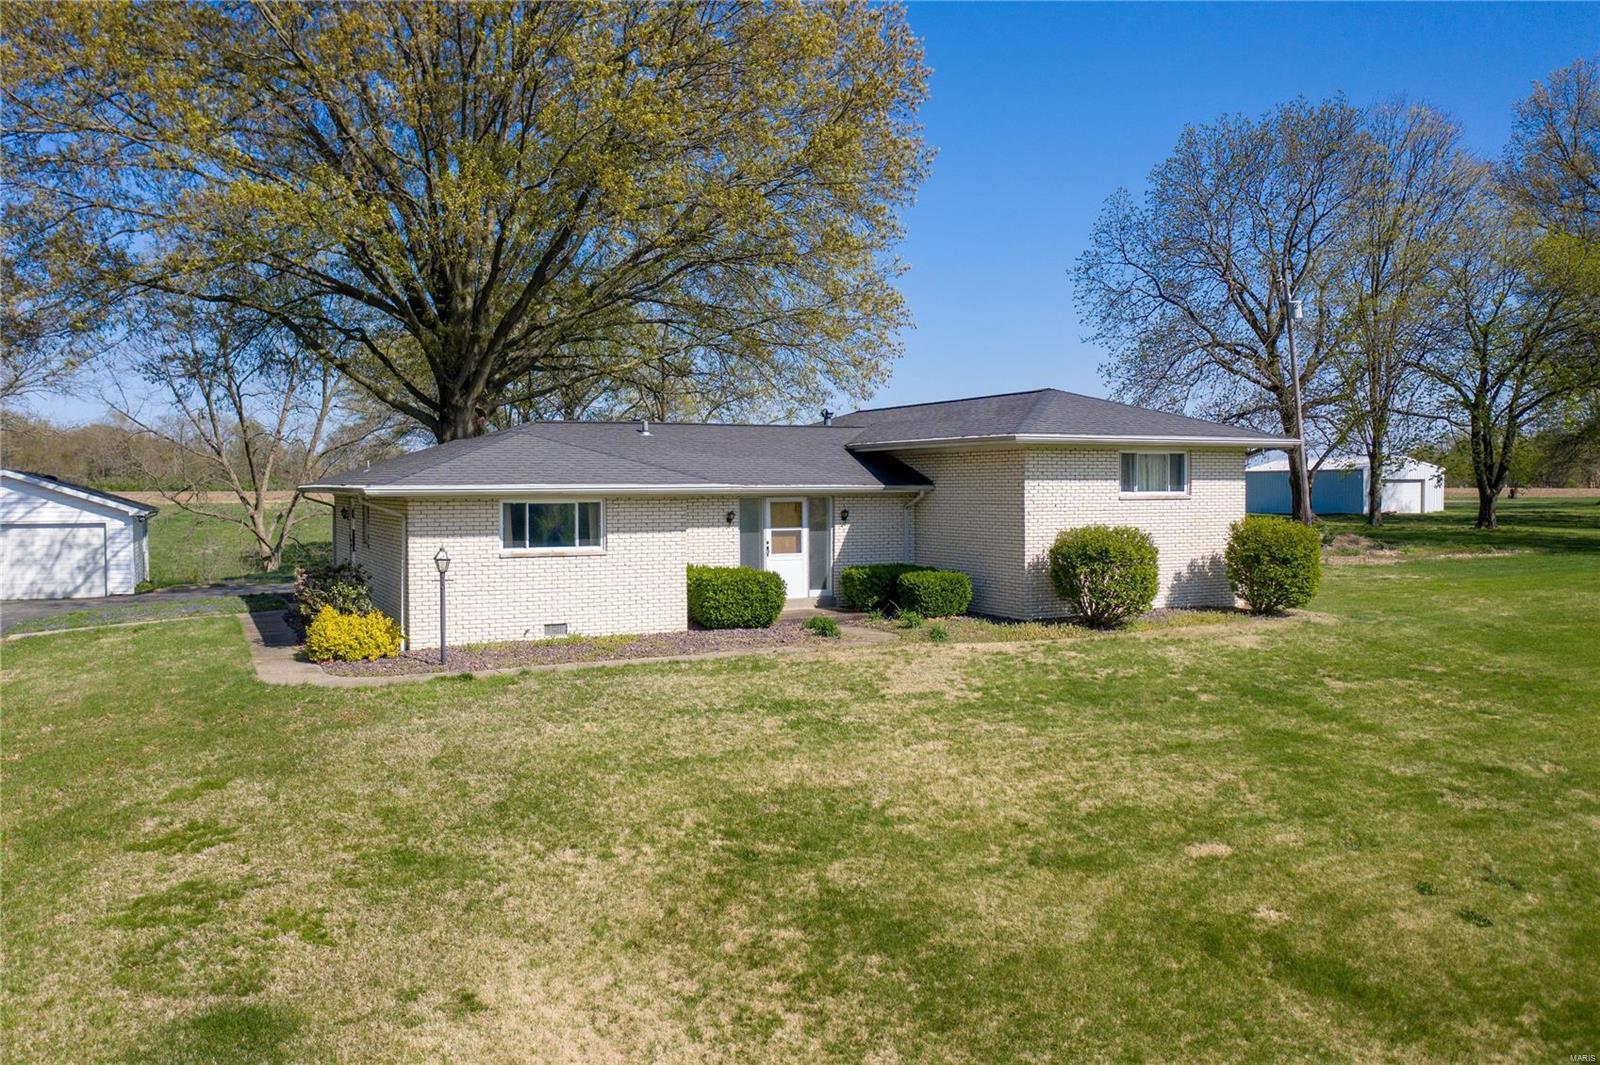 7432 N Illinois Street Property Photo - Caseyville, IL real estate listing